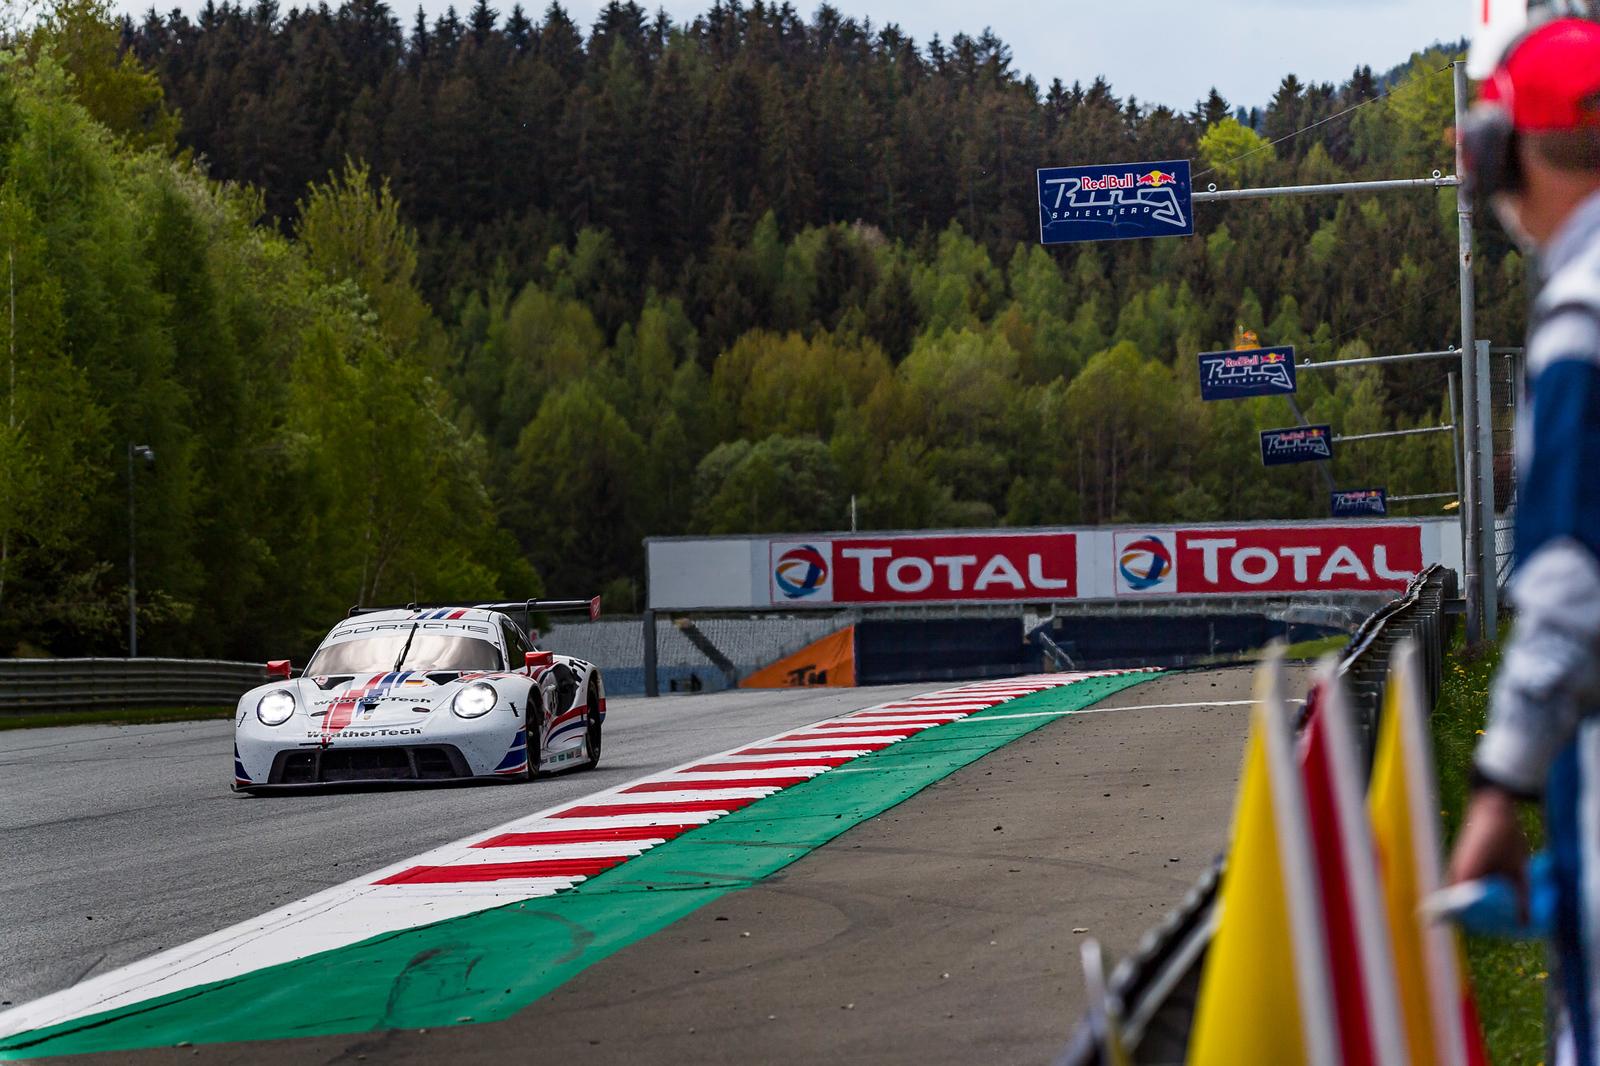 Porsche on straight away.